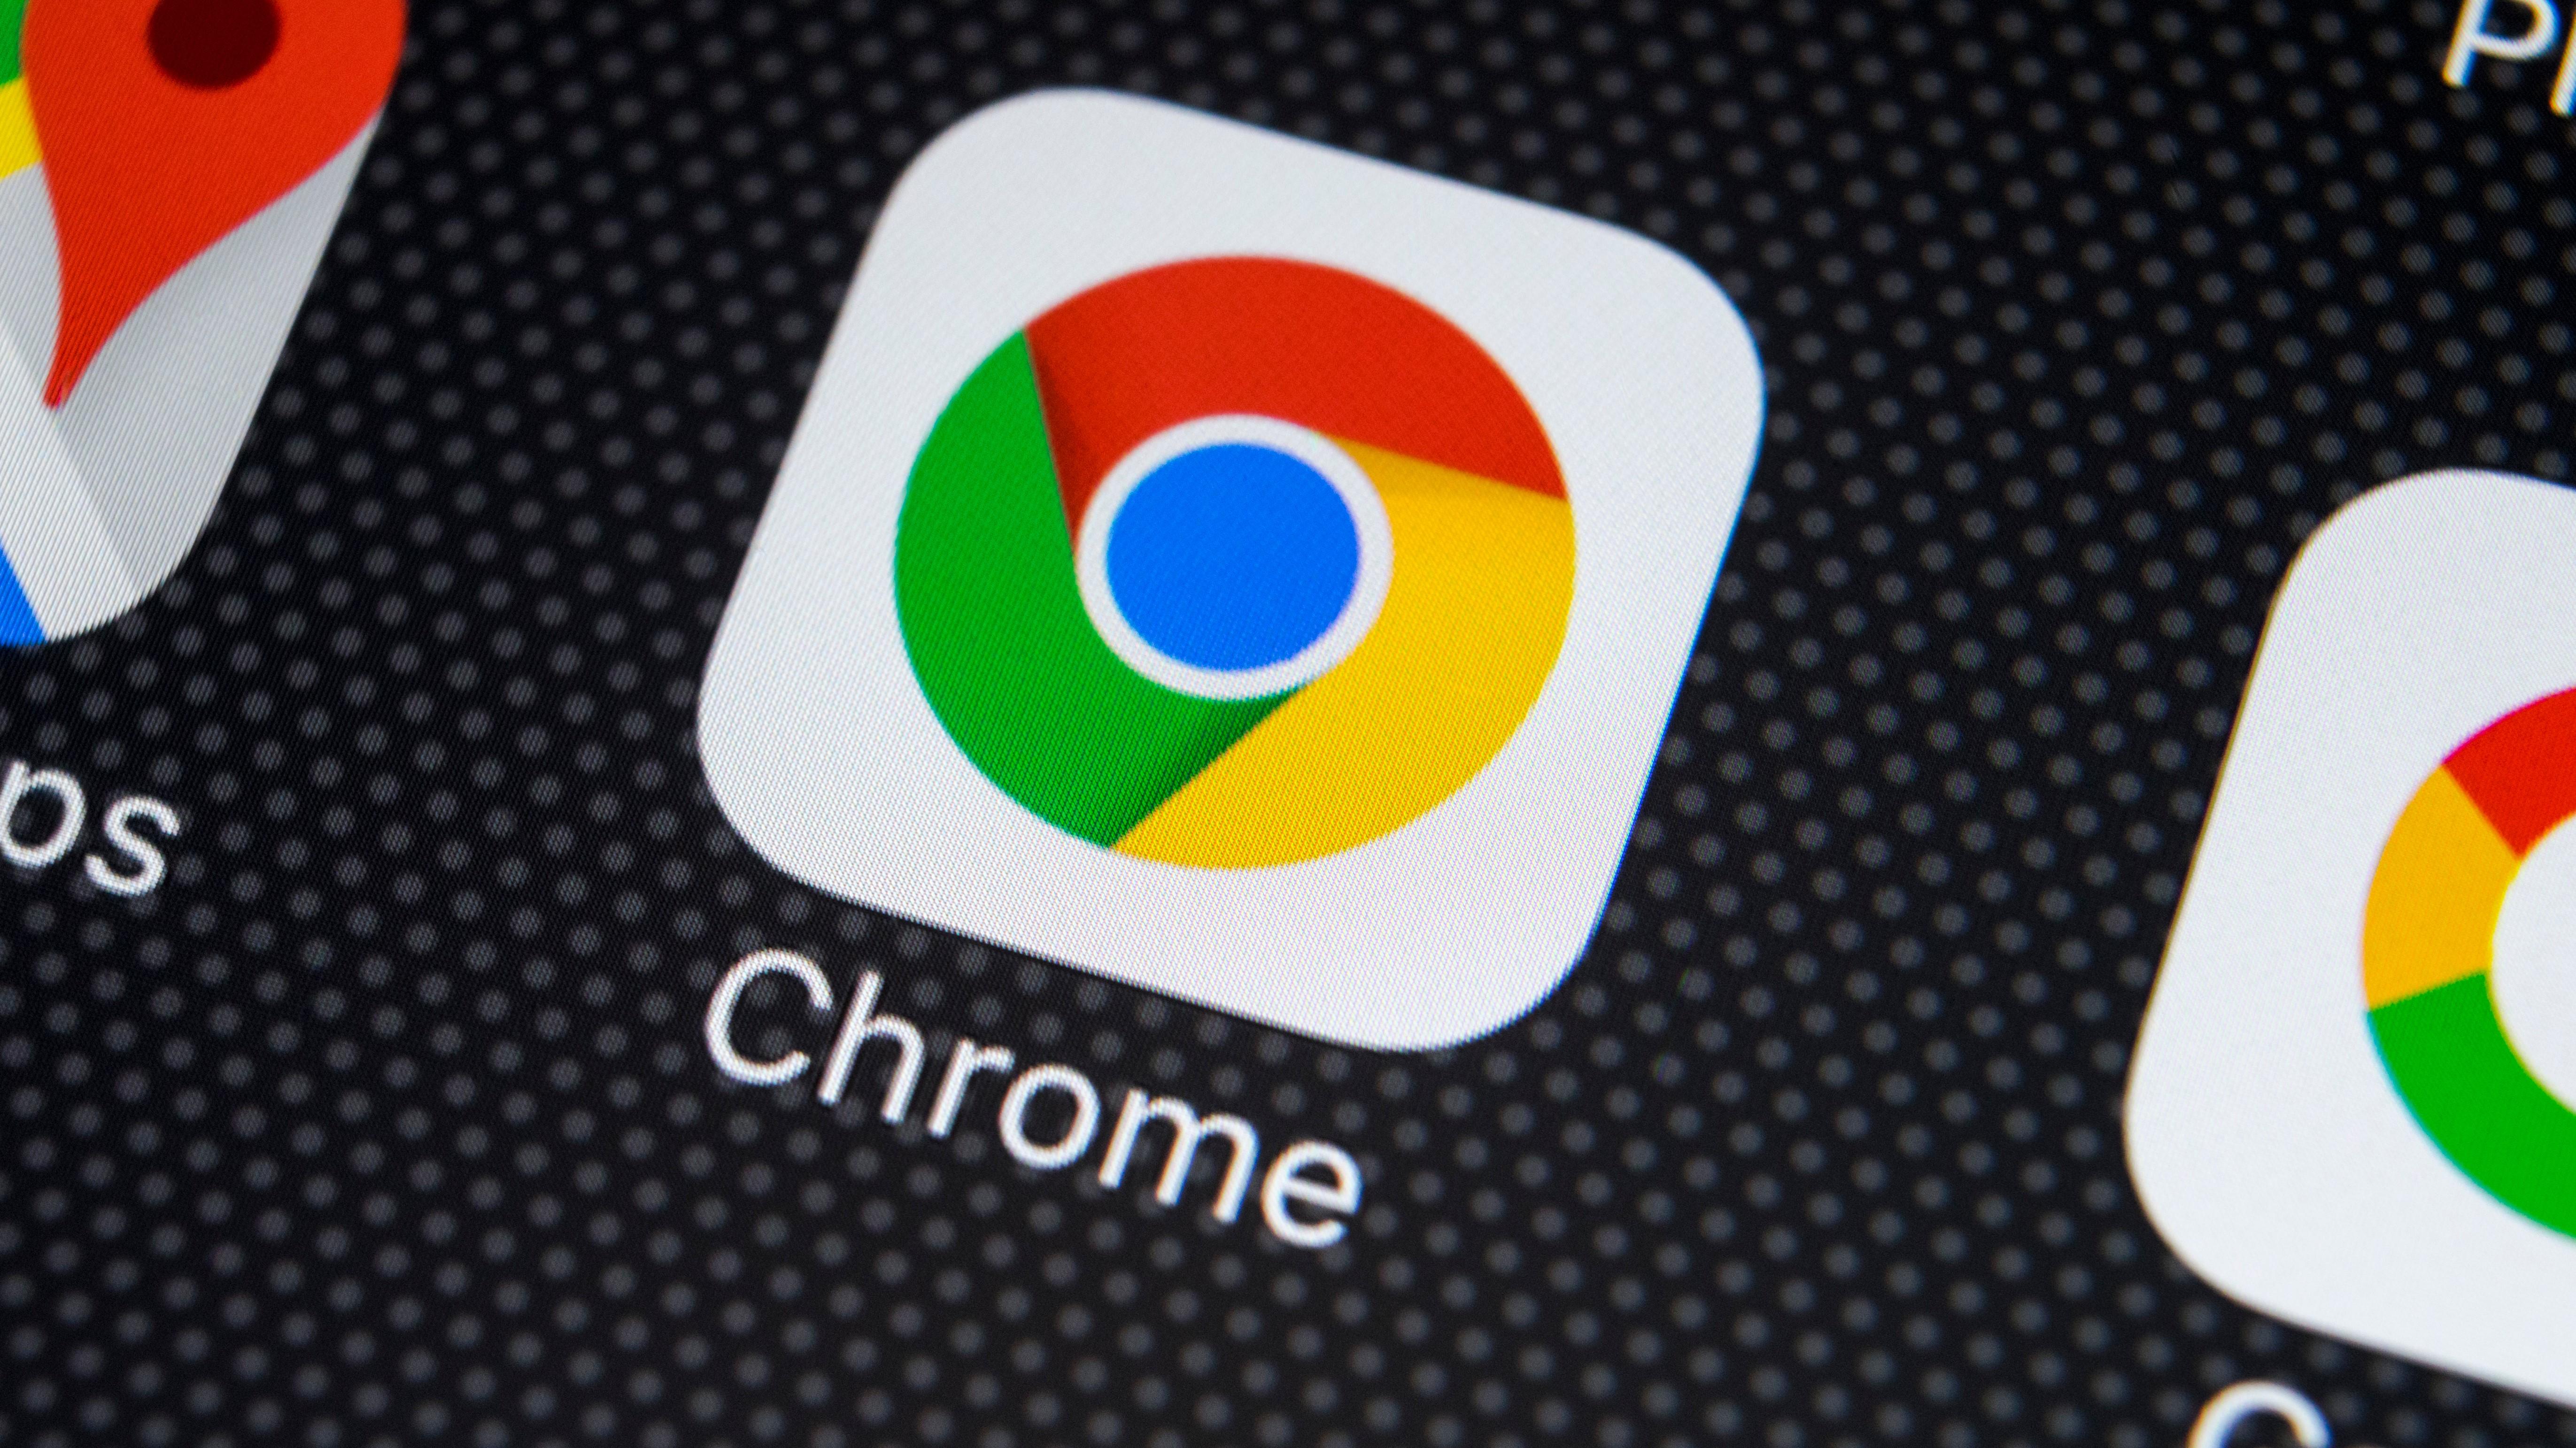 Google chrome latest version 2020